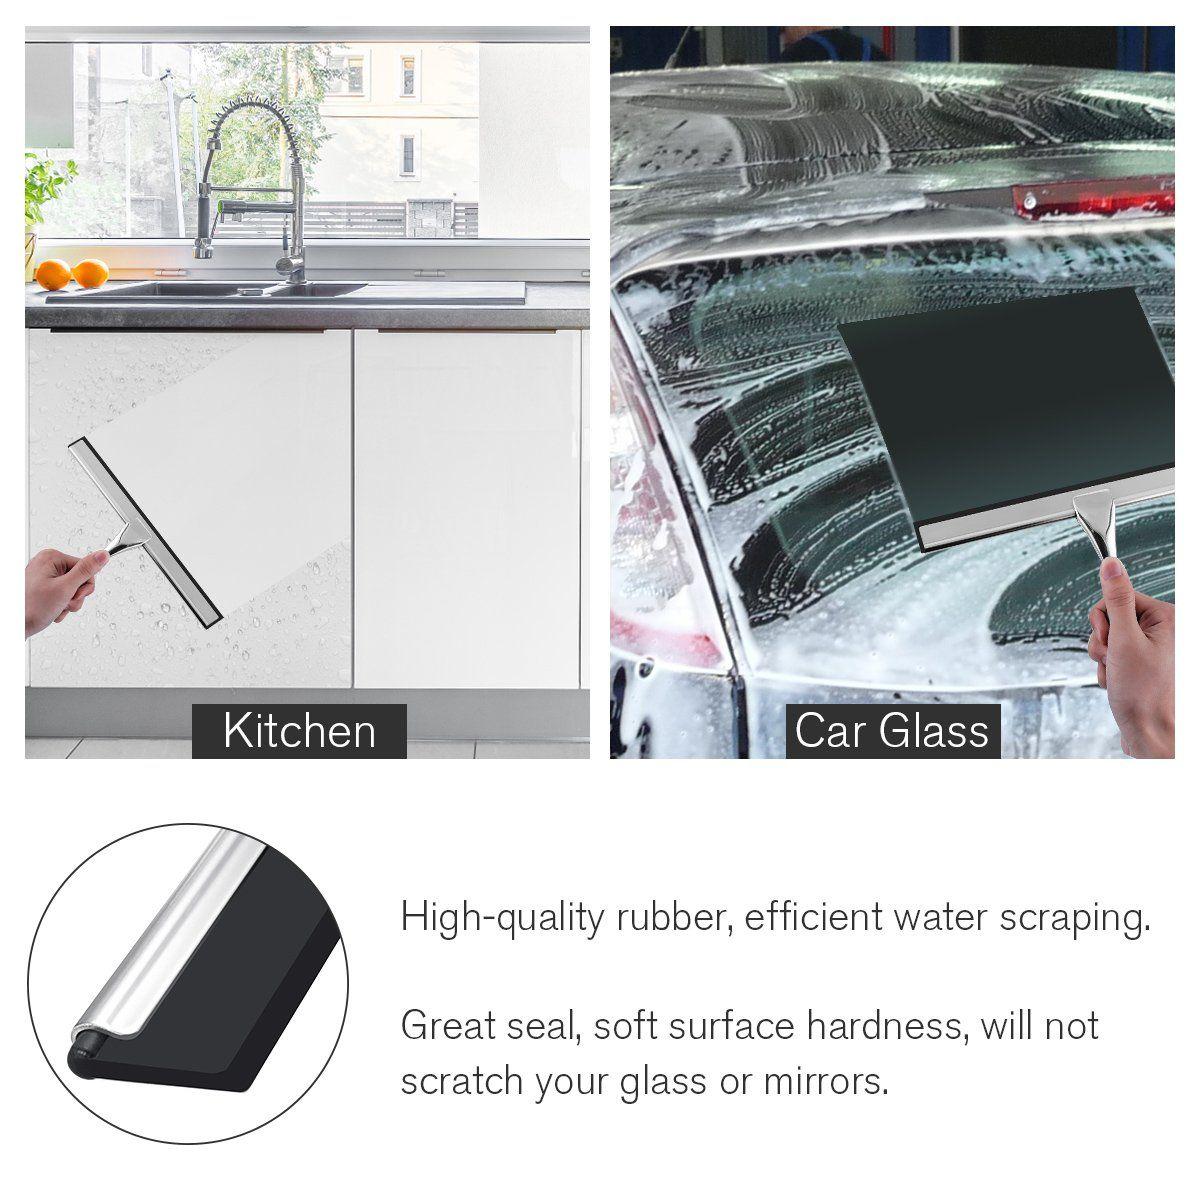 Baban Shower Squeegee Glass Squeegee Window Squeegee Allpurpose